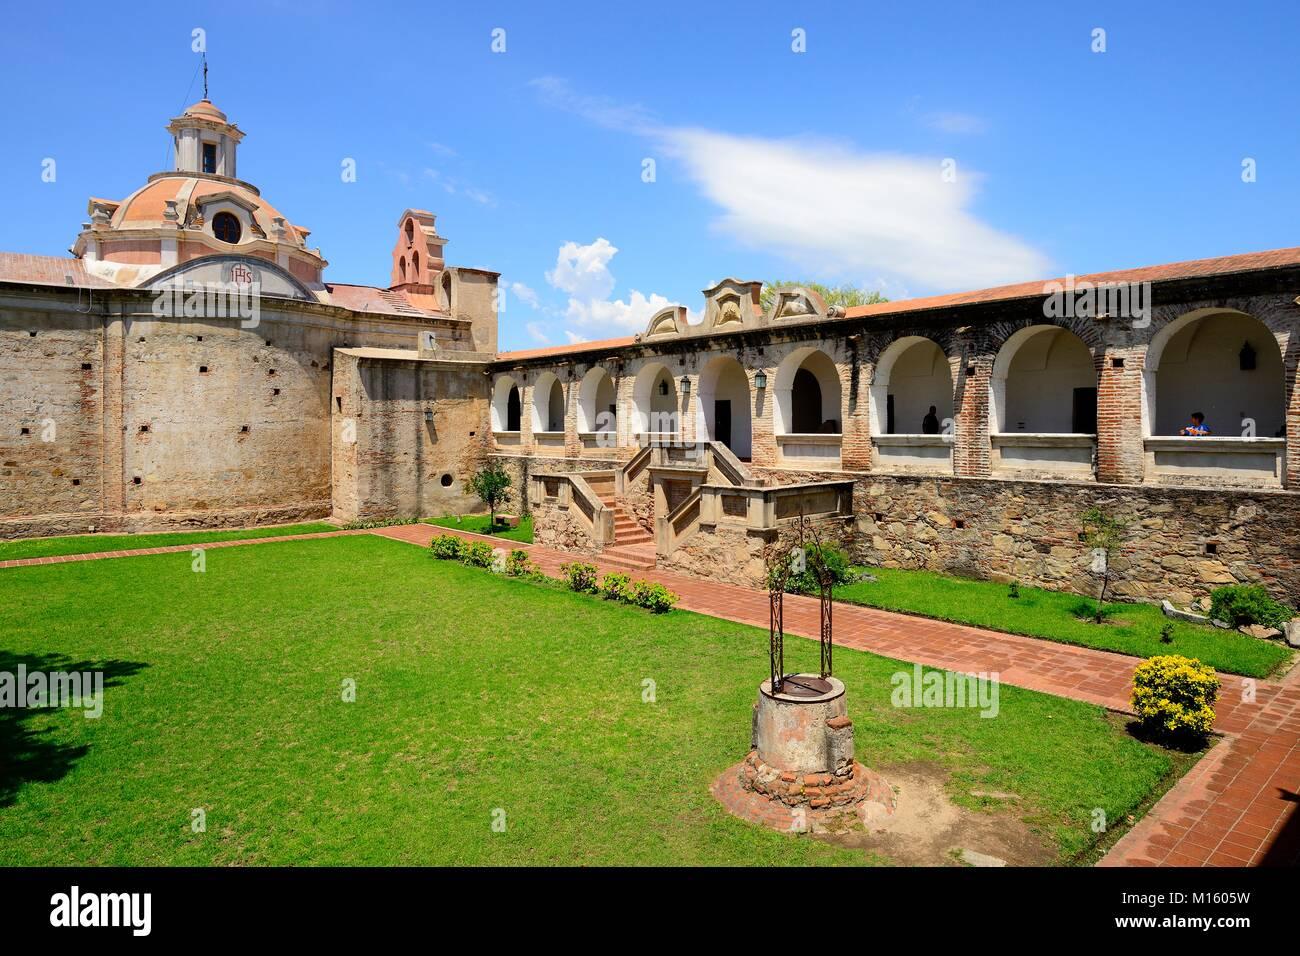 Arcade and Church of the Jesuit Mission,Museo Estancia Jesuitica,Alta Gracia,Province of Córdoba,Argentina - Stock Image